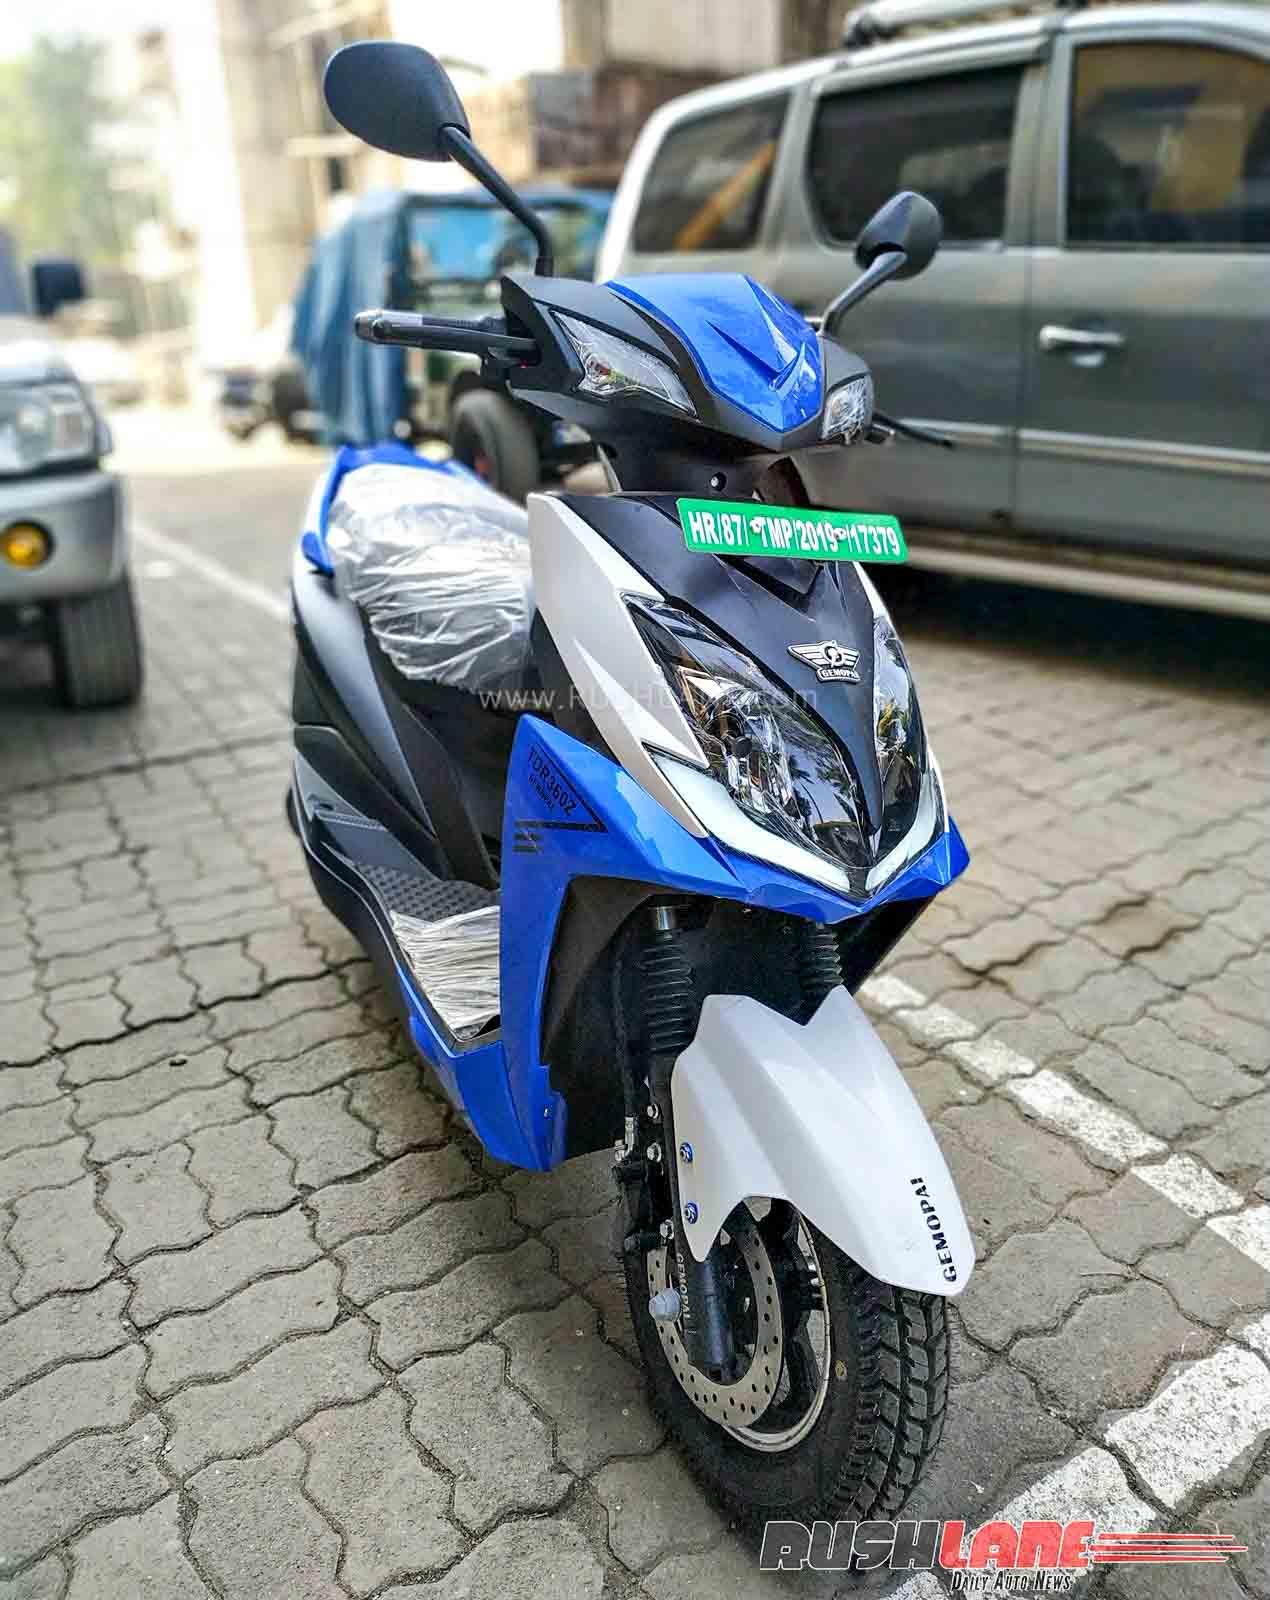 Gemopai electric scooter review